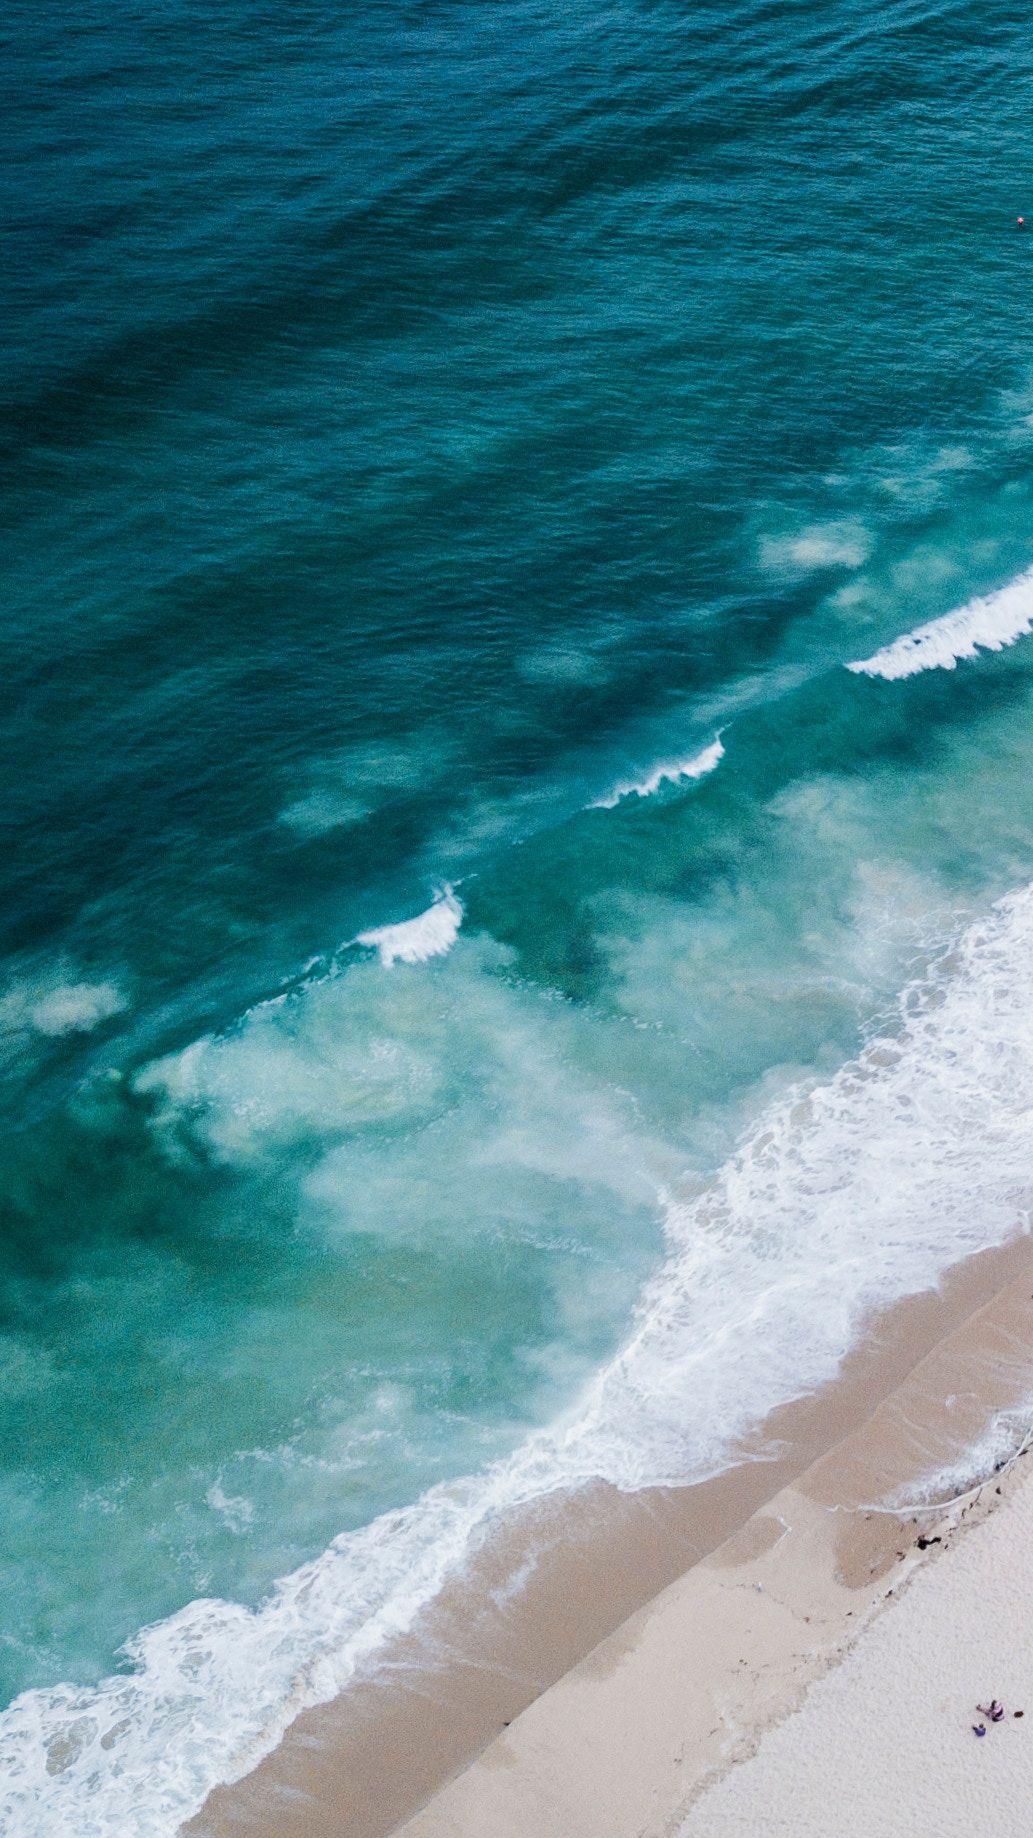 Wallpaper Iphone Android Beach Wallpaper Iphone Ocean Wallpaper Desktop Wallpapers Tumblr